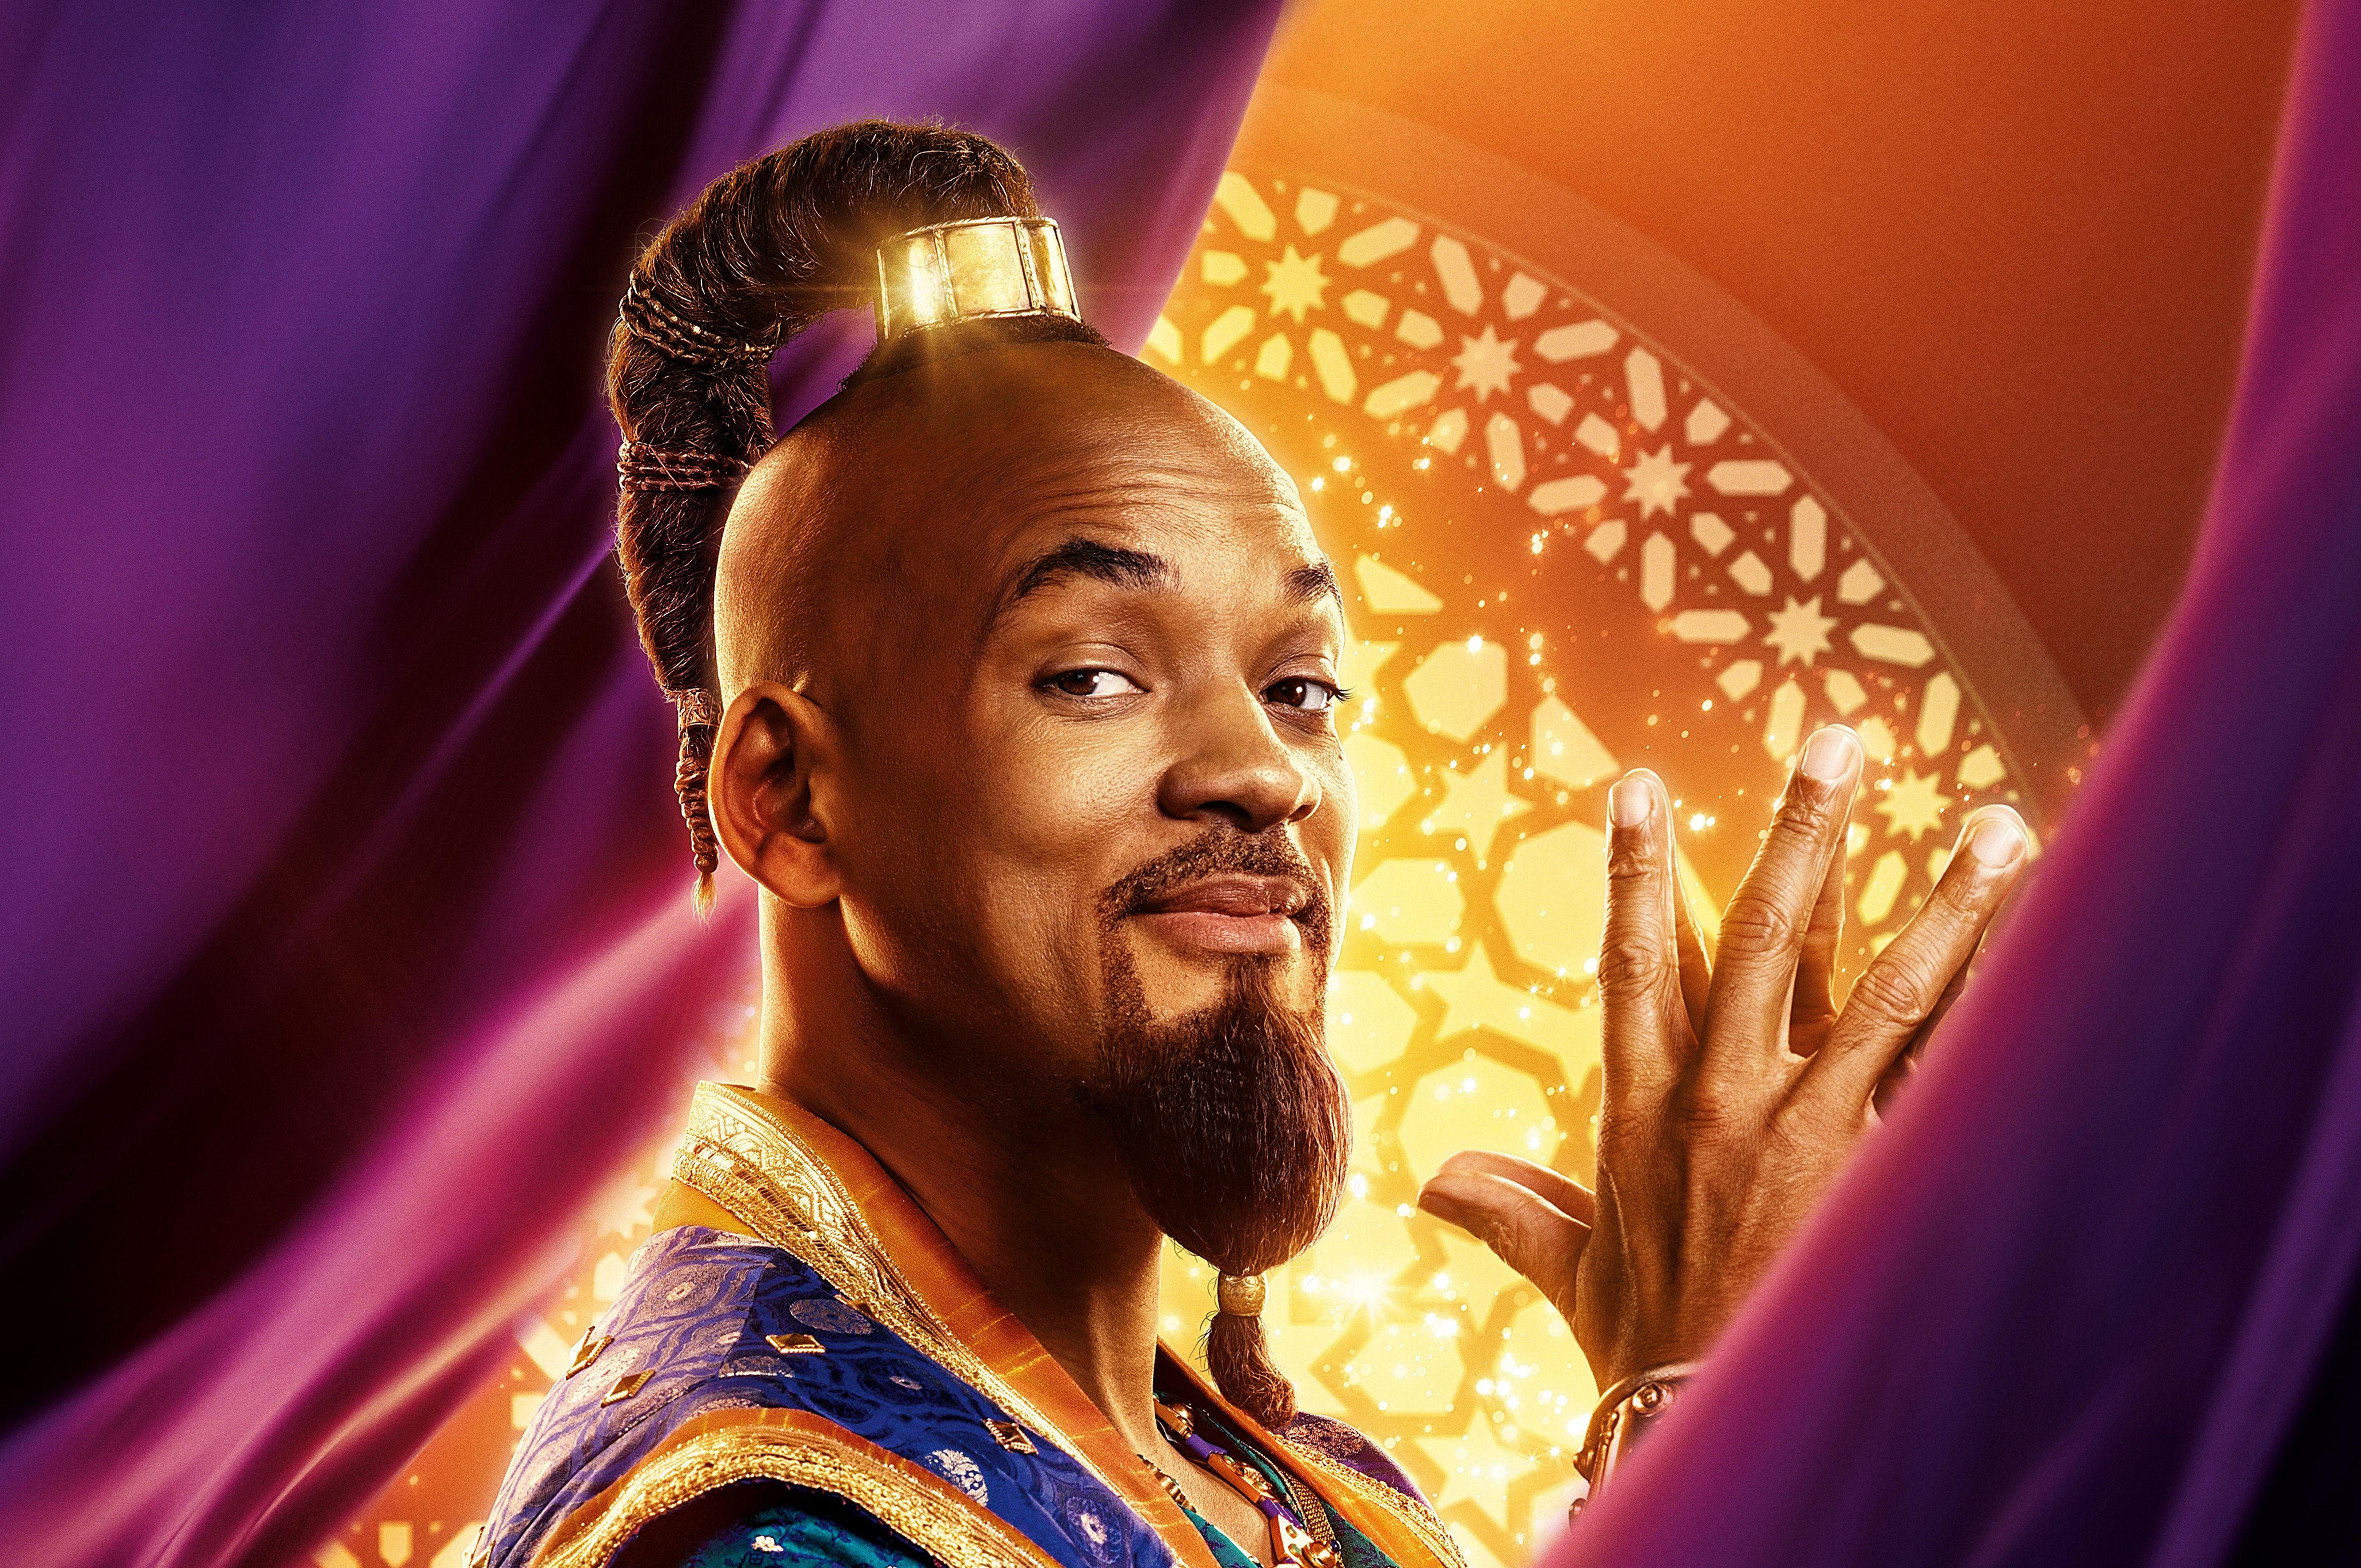 5k Background Will Smith Genie Aladdin 2019 4722 Wallpapers and 5120x3400